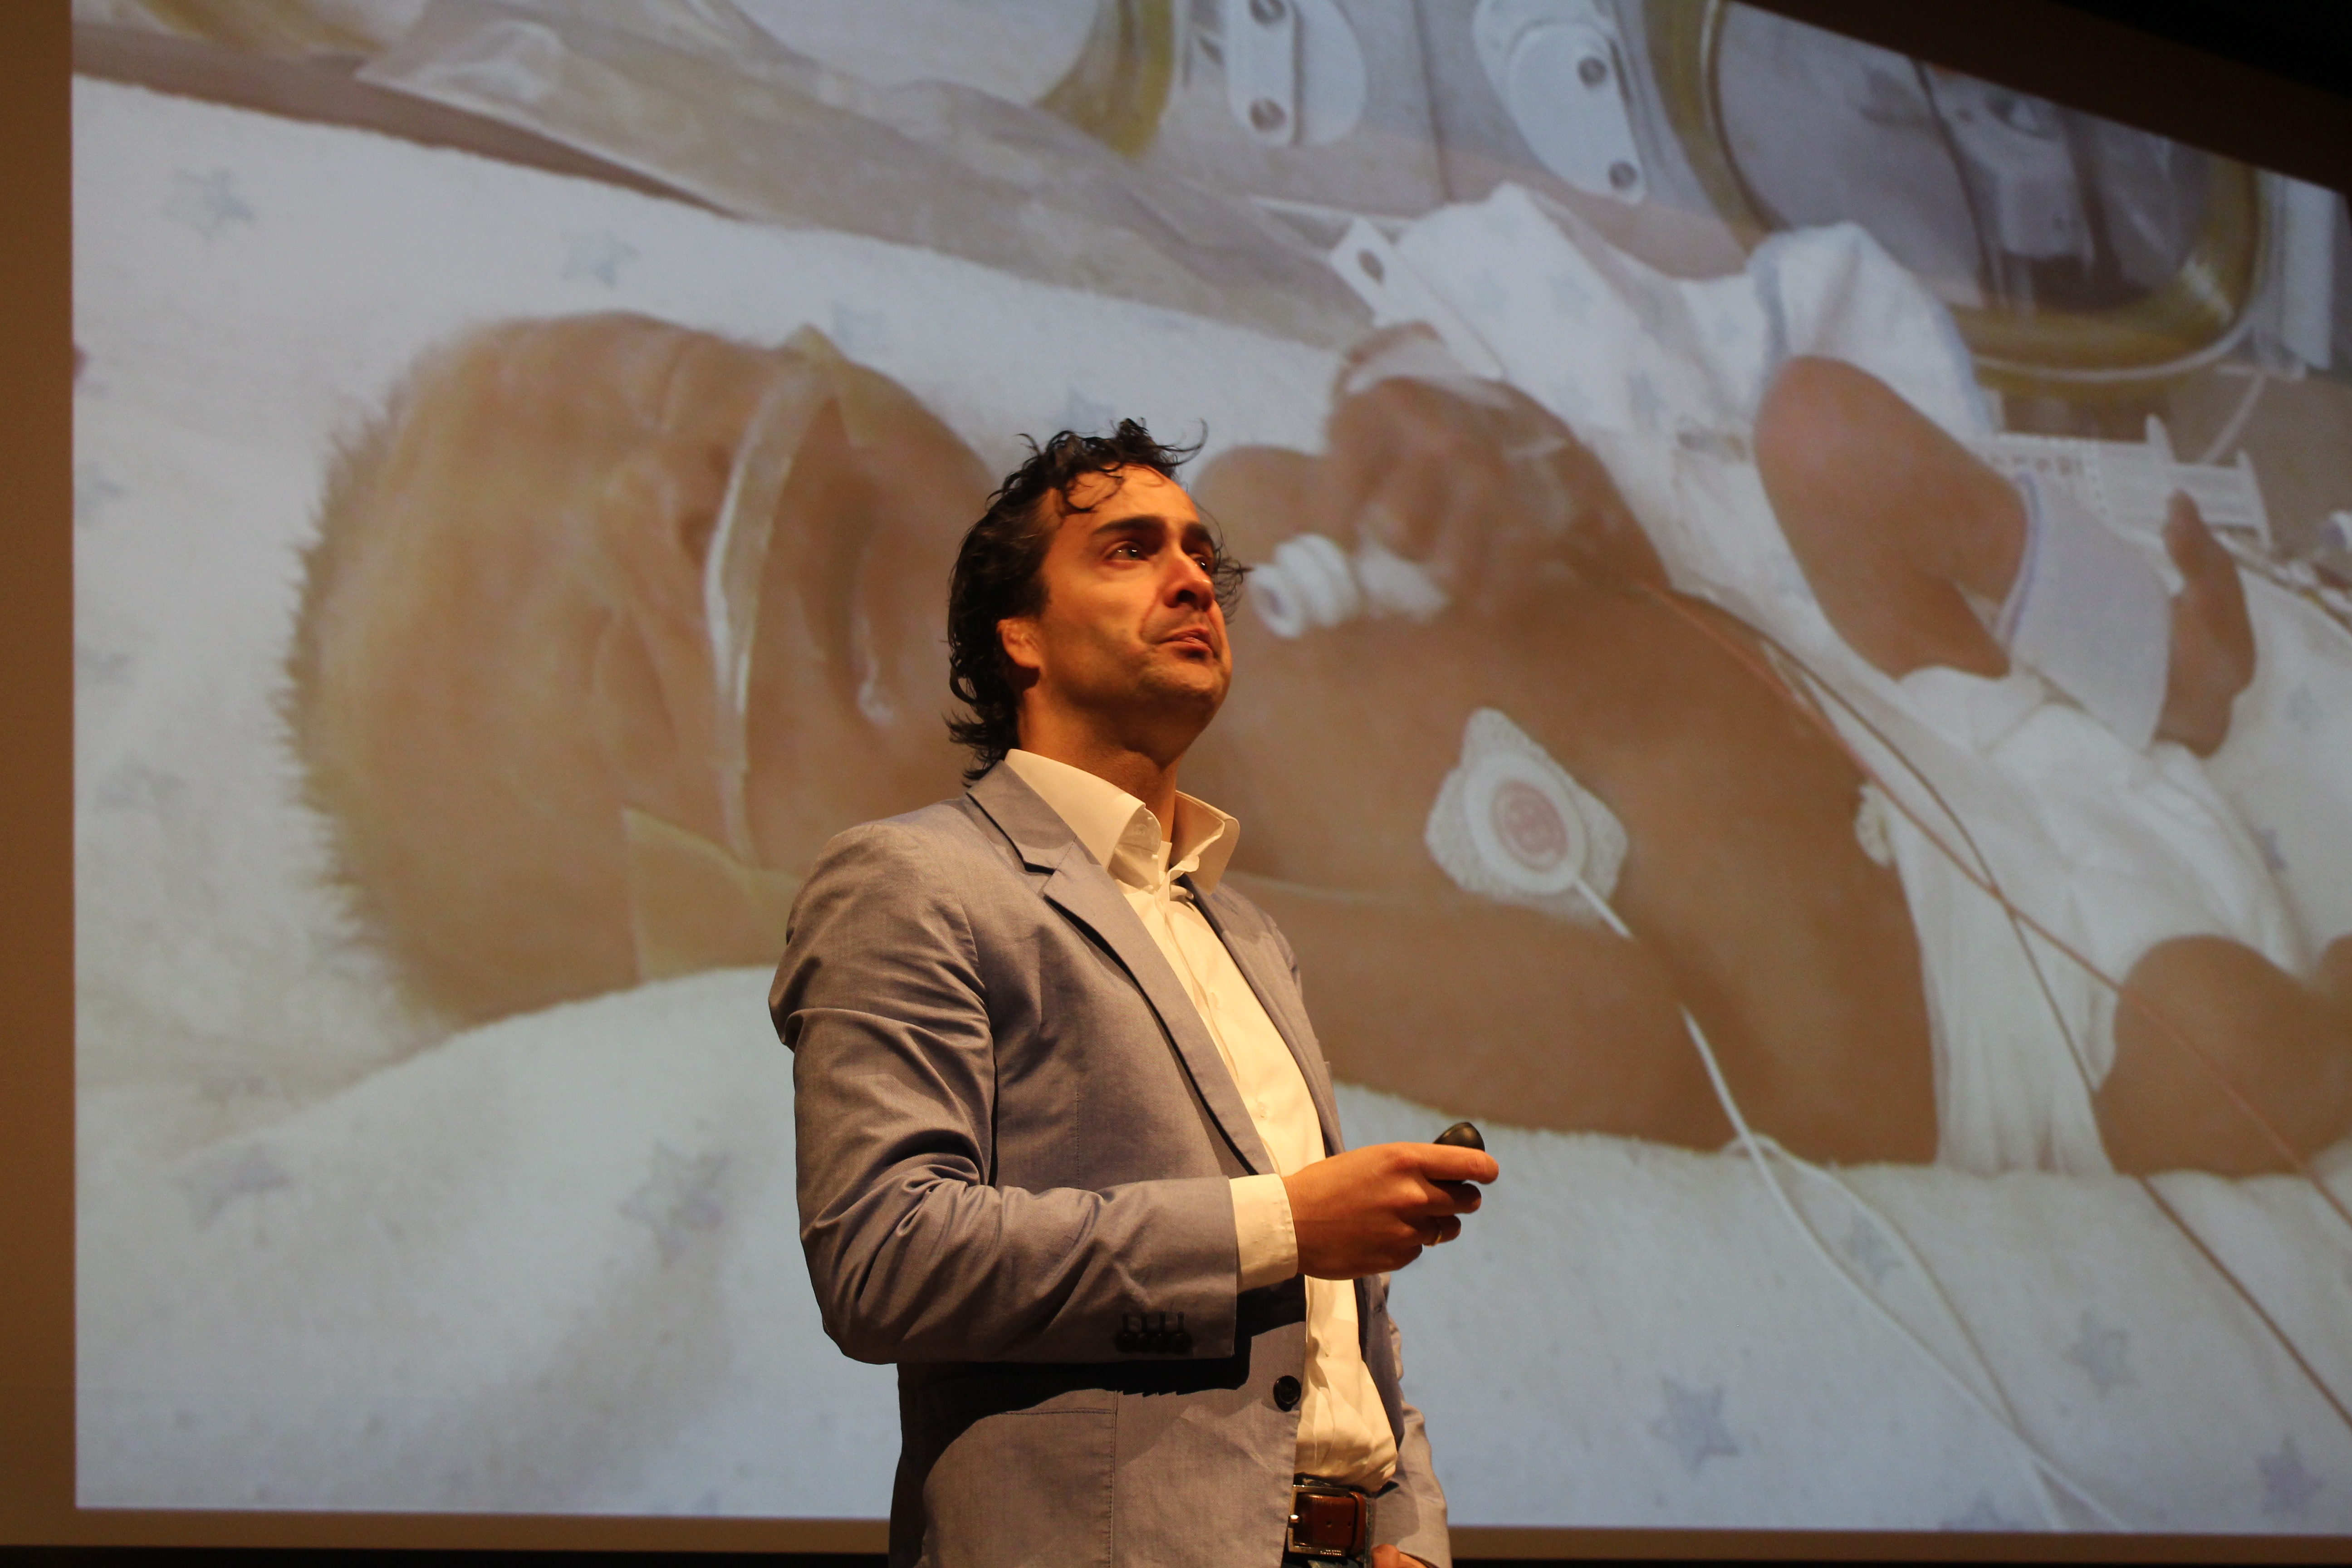 Bambi Medical's Fabio Bambang Oetomo